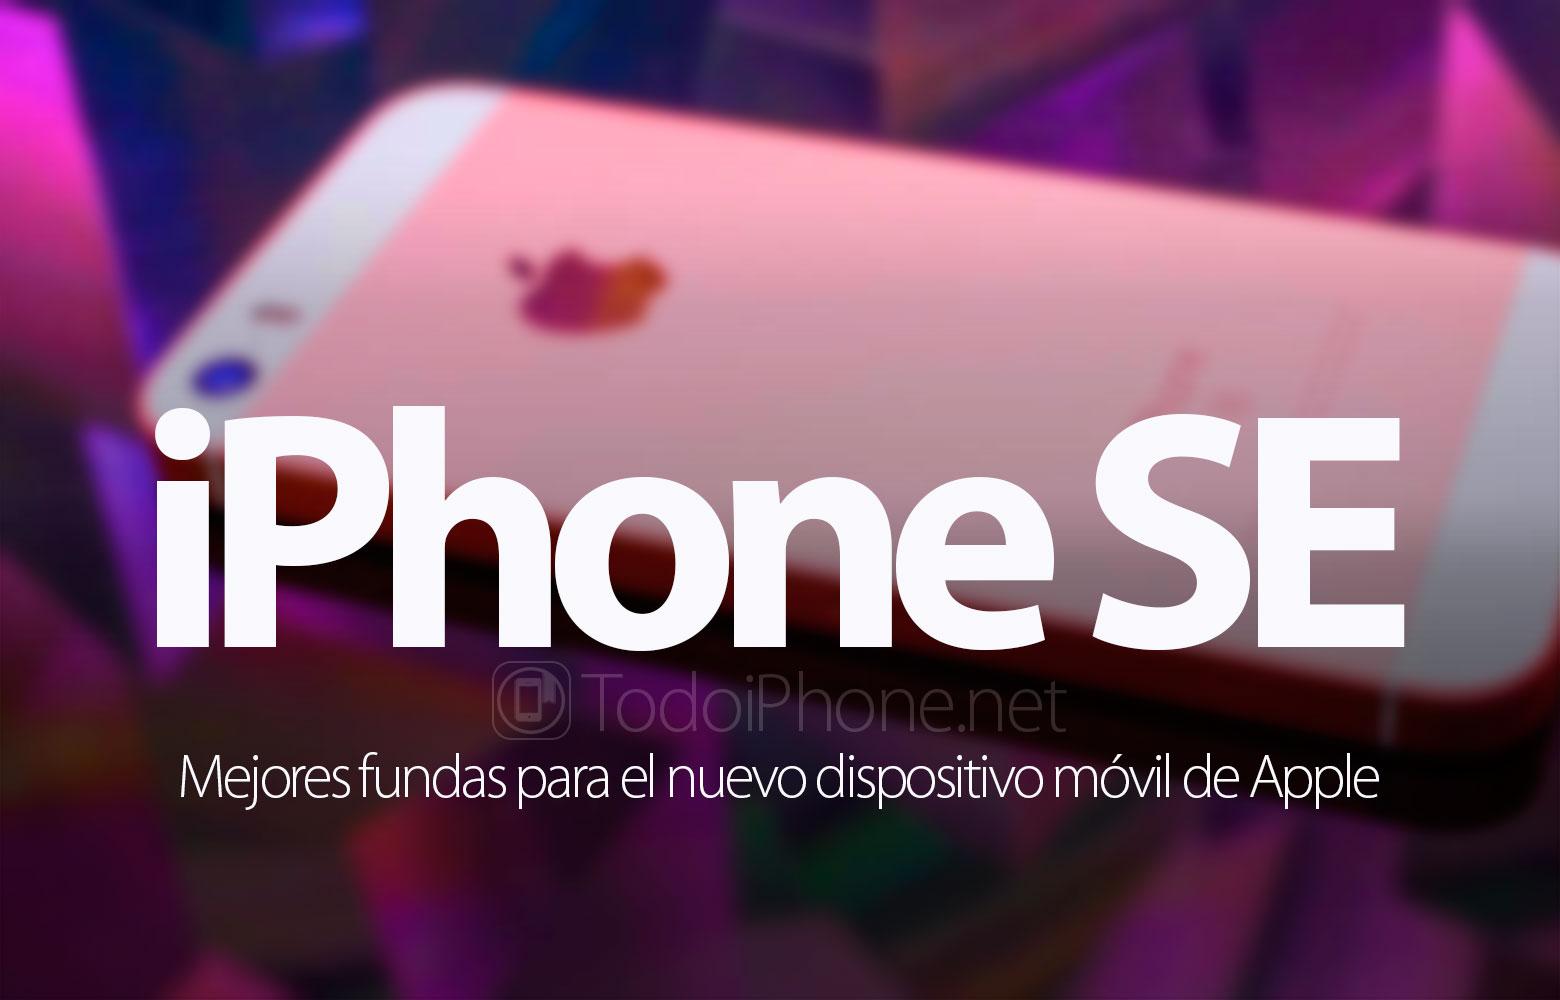 iphone-se-mejores-fundas-nuevo-movil-apple